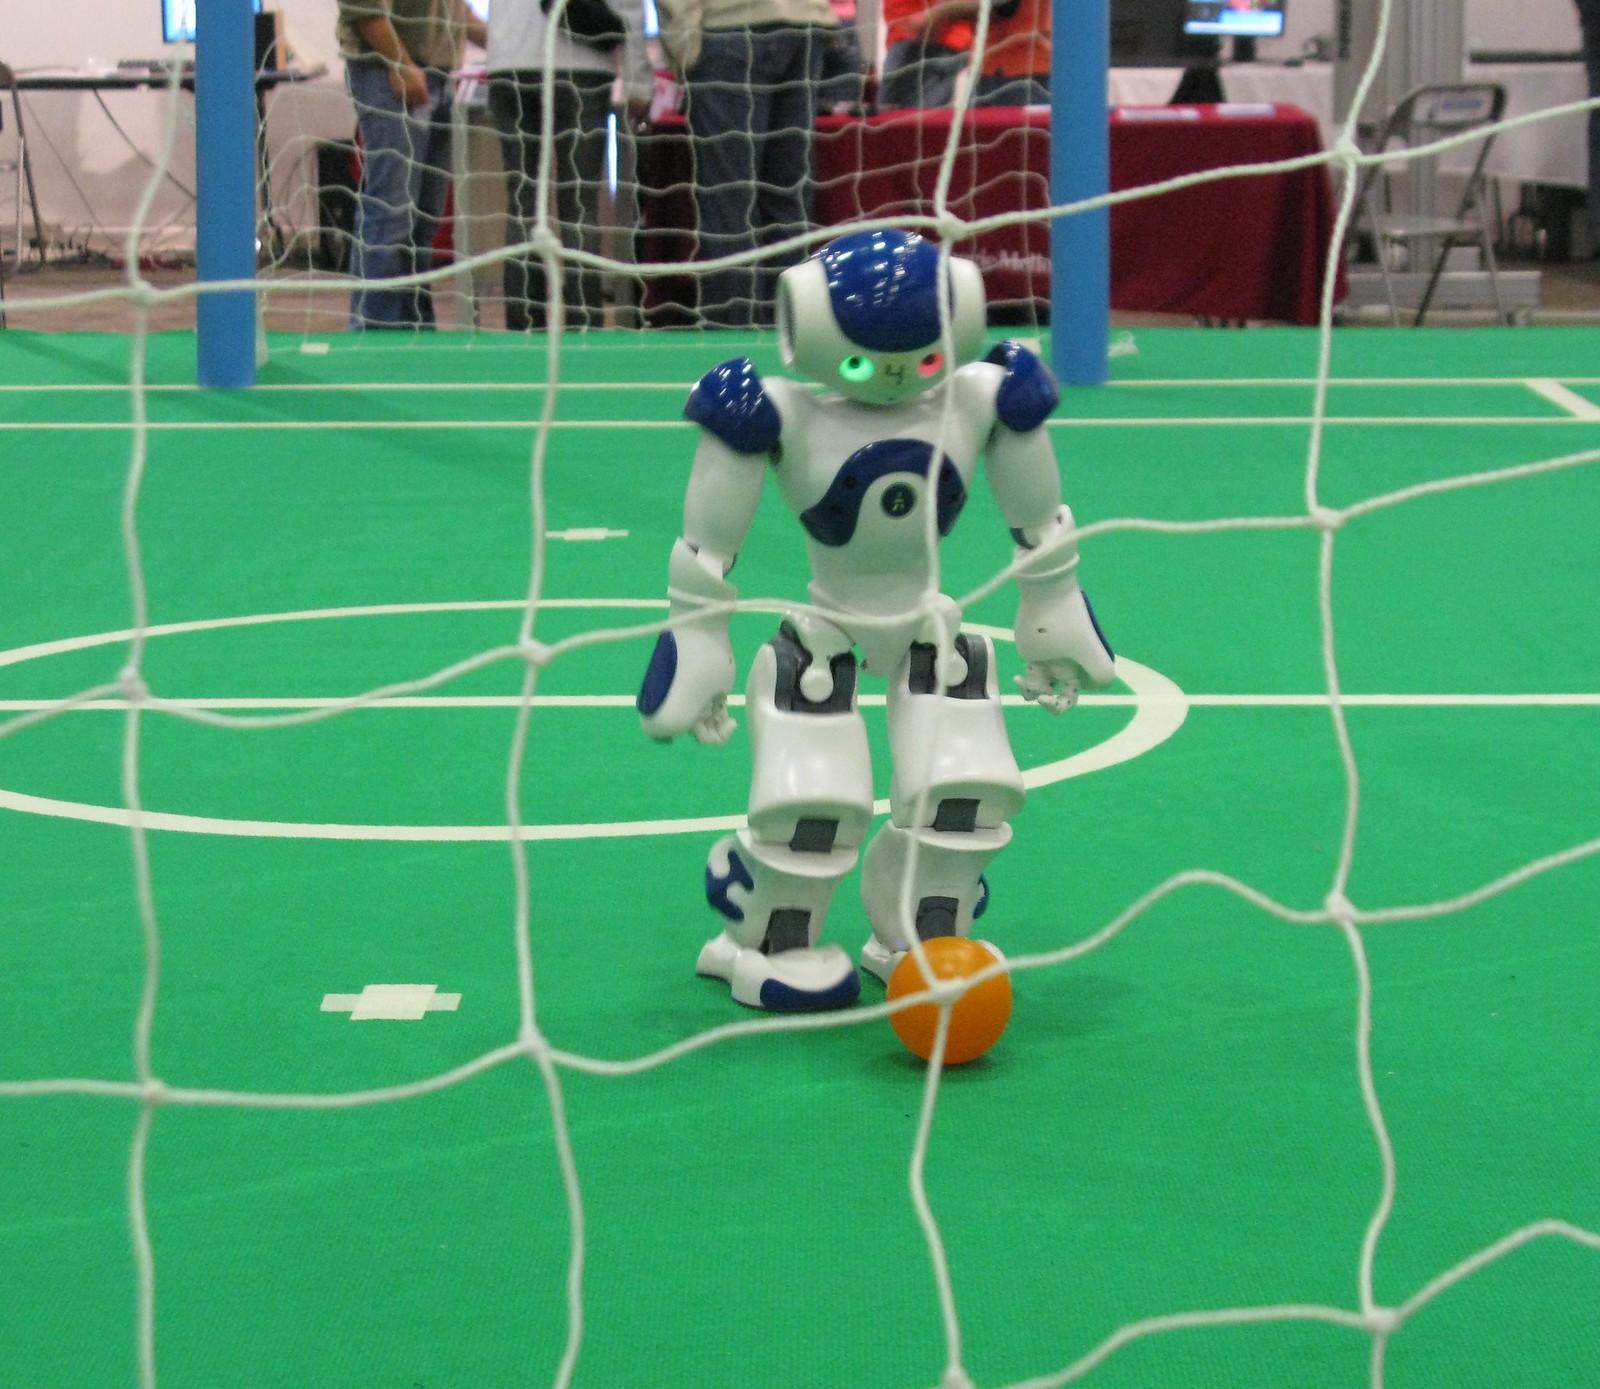 Autonomous robot soccer (football) player